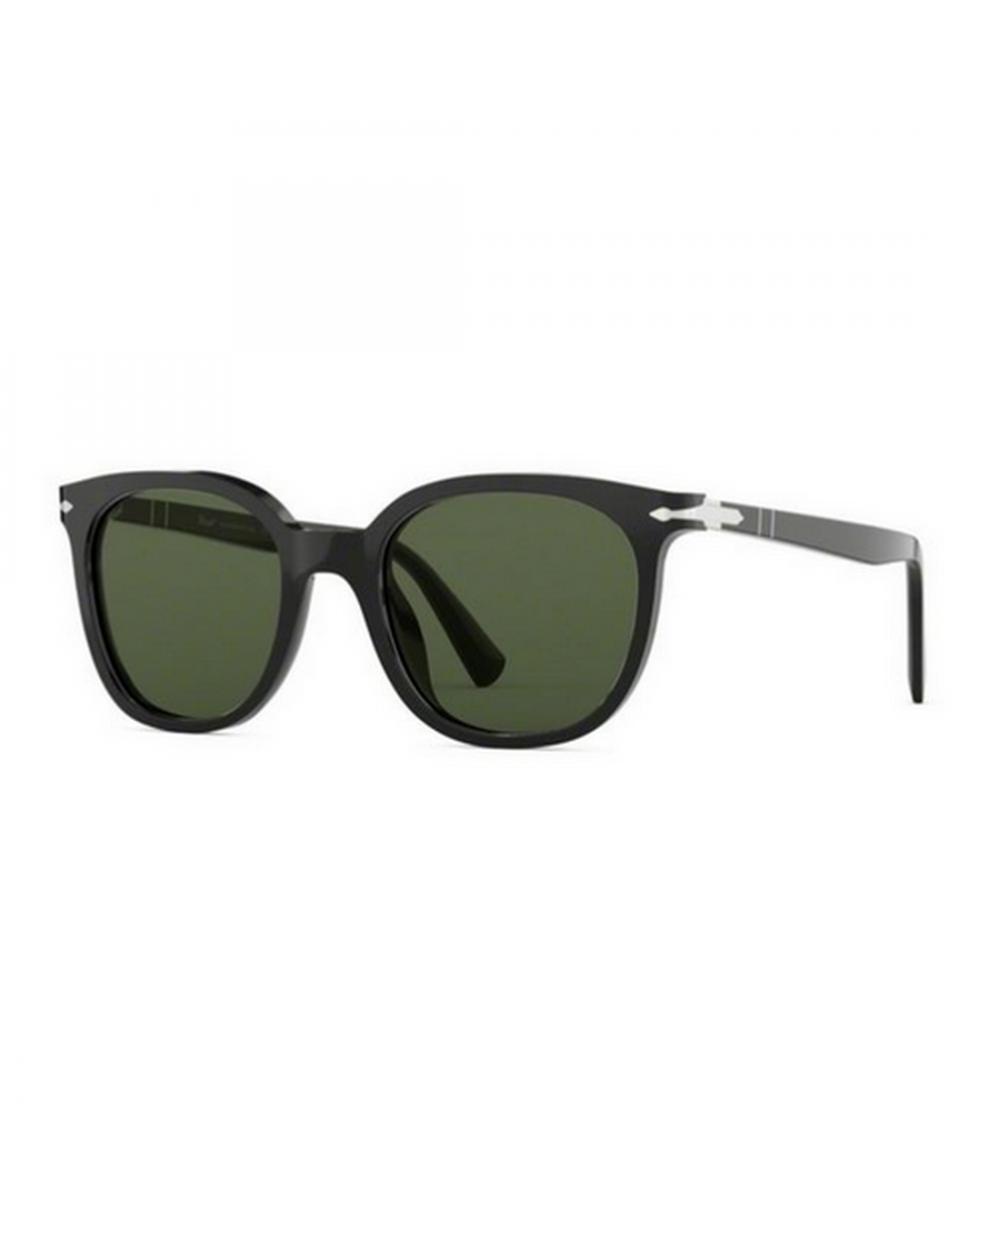 Sonnenbrille Persol PO 3216S originalverpackung garantie Italien